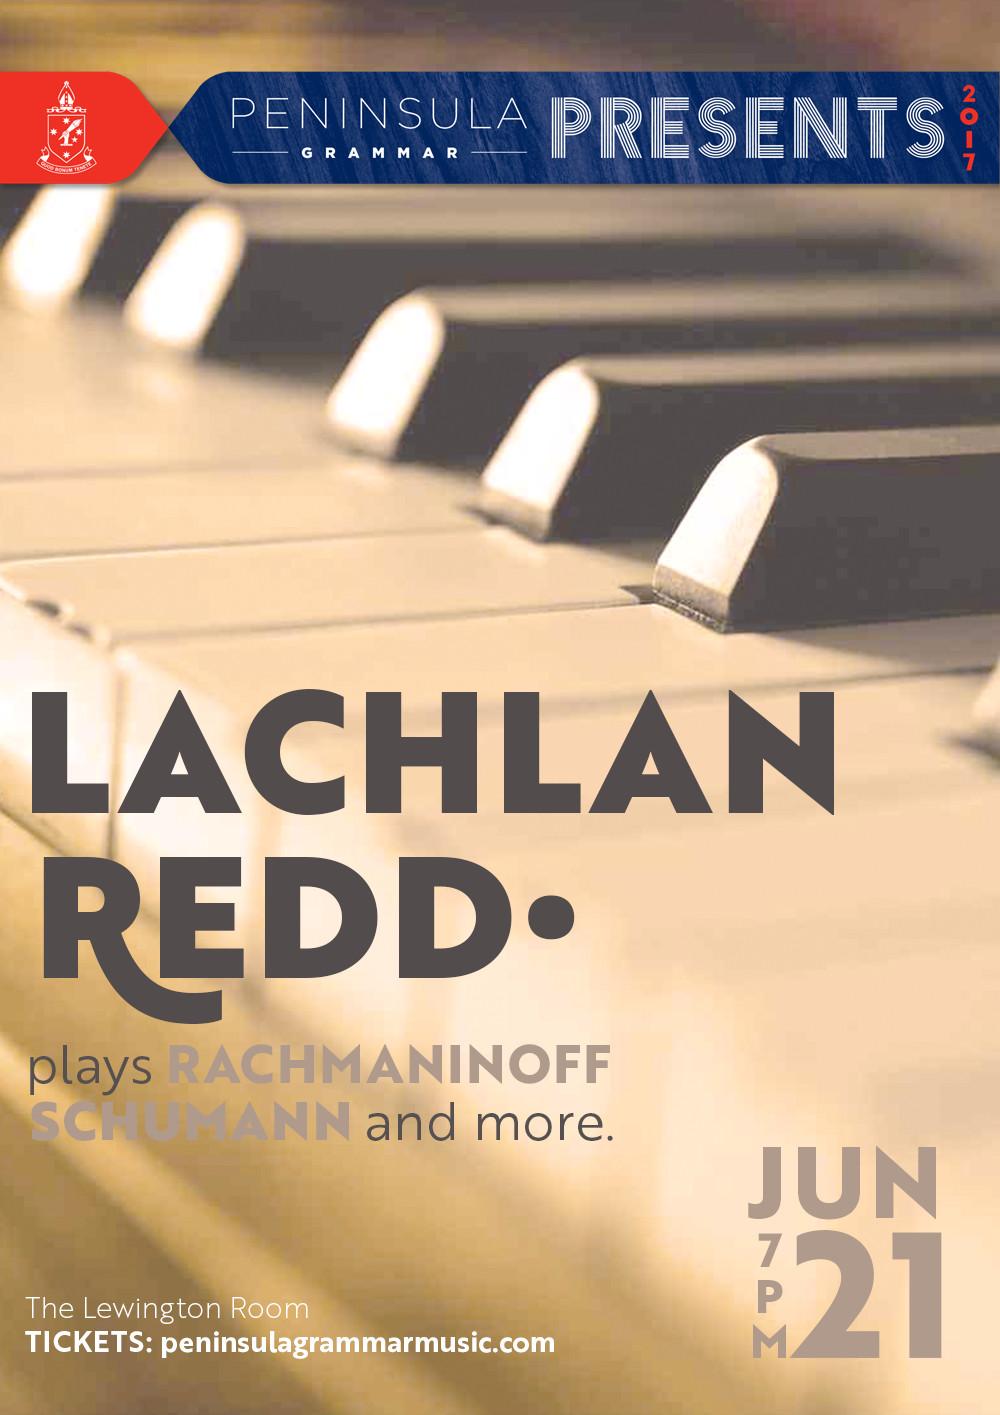 LAchlan REdd Poster WEB.jpg